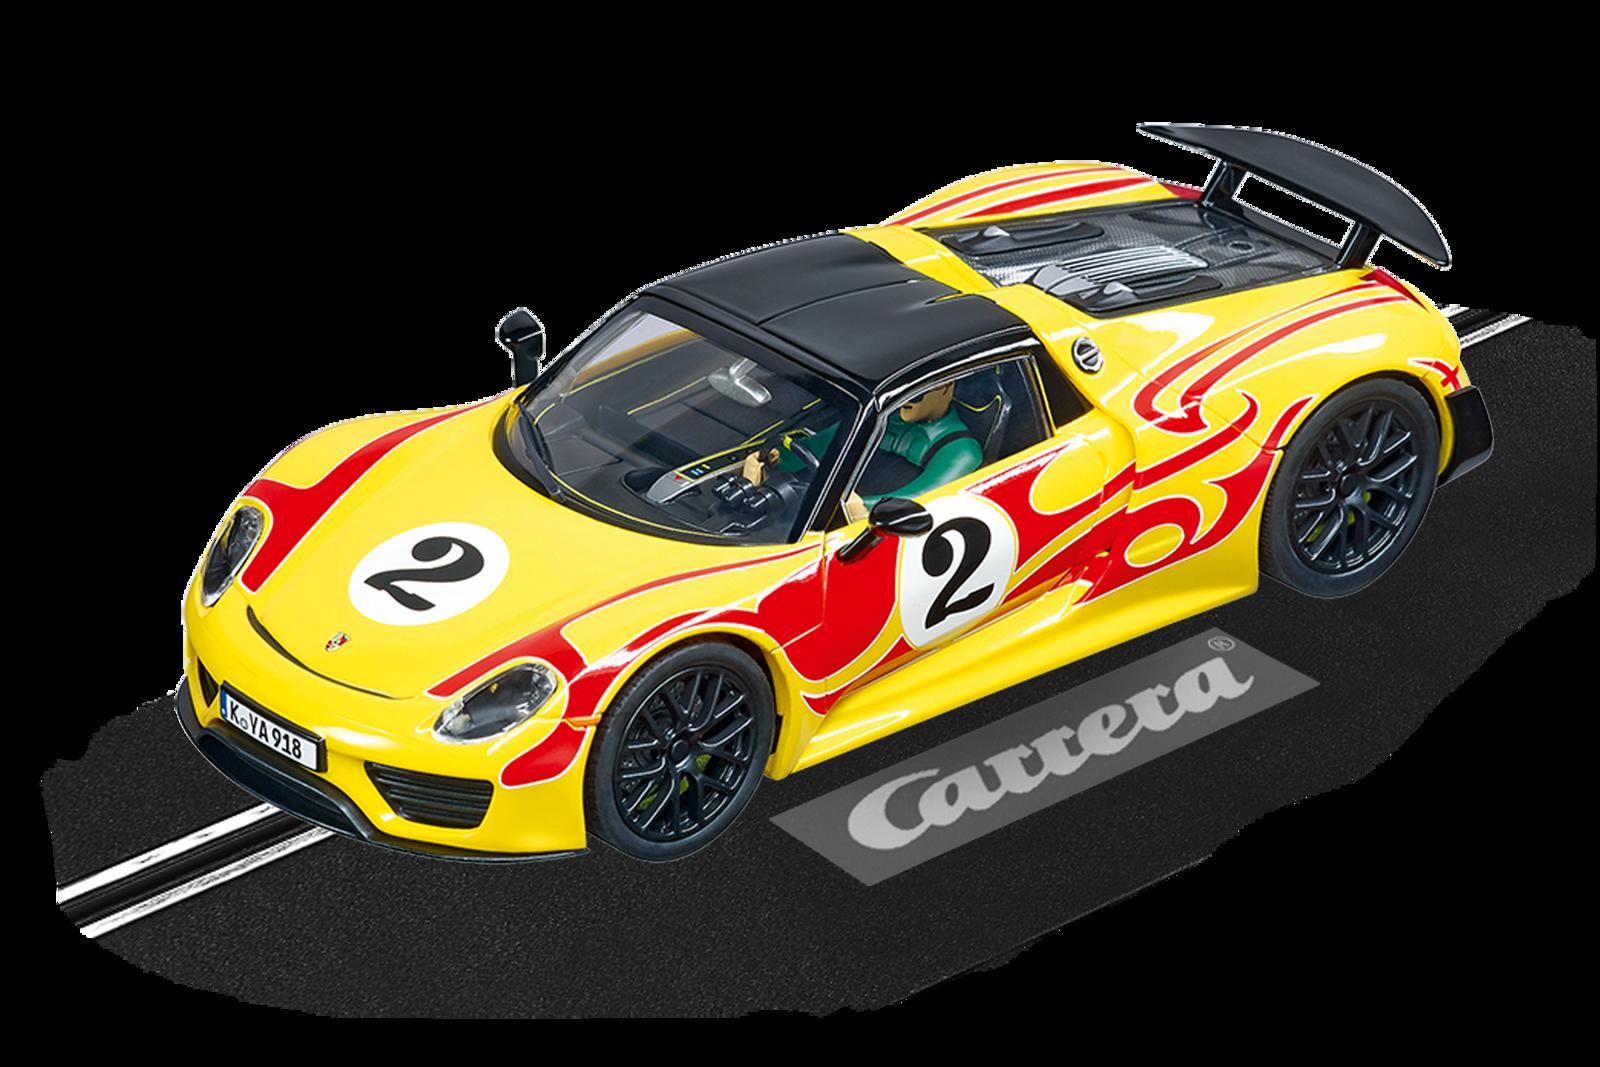 Porsche 918 Spyder #2 (30877)